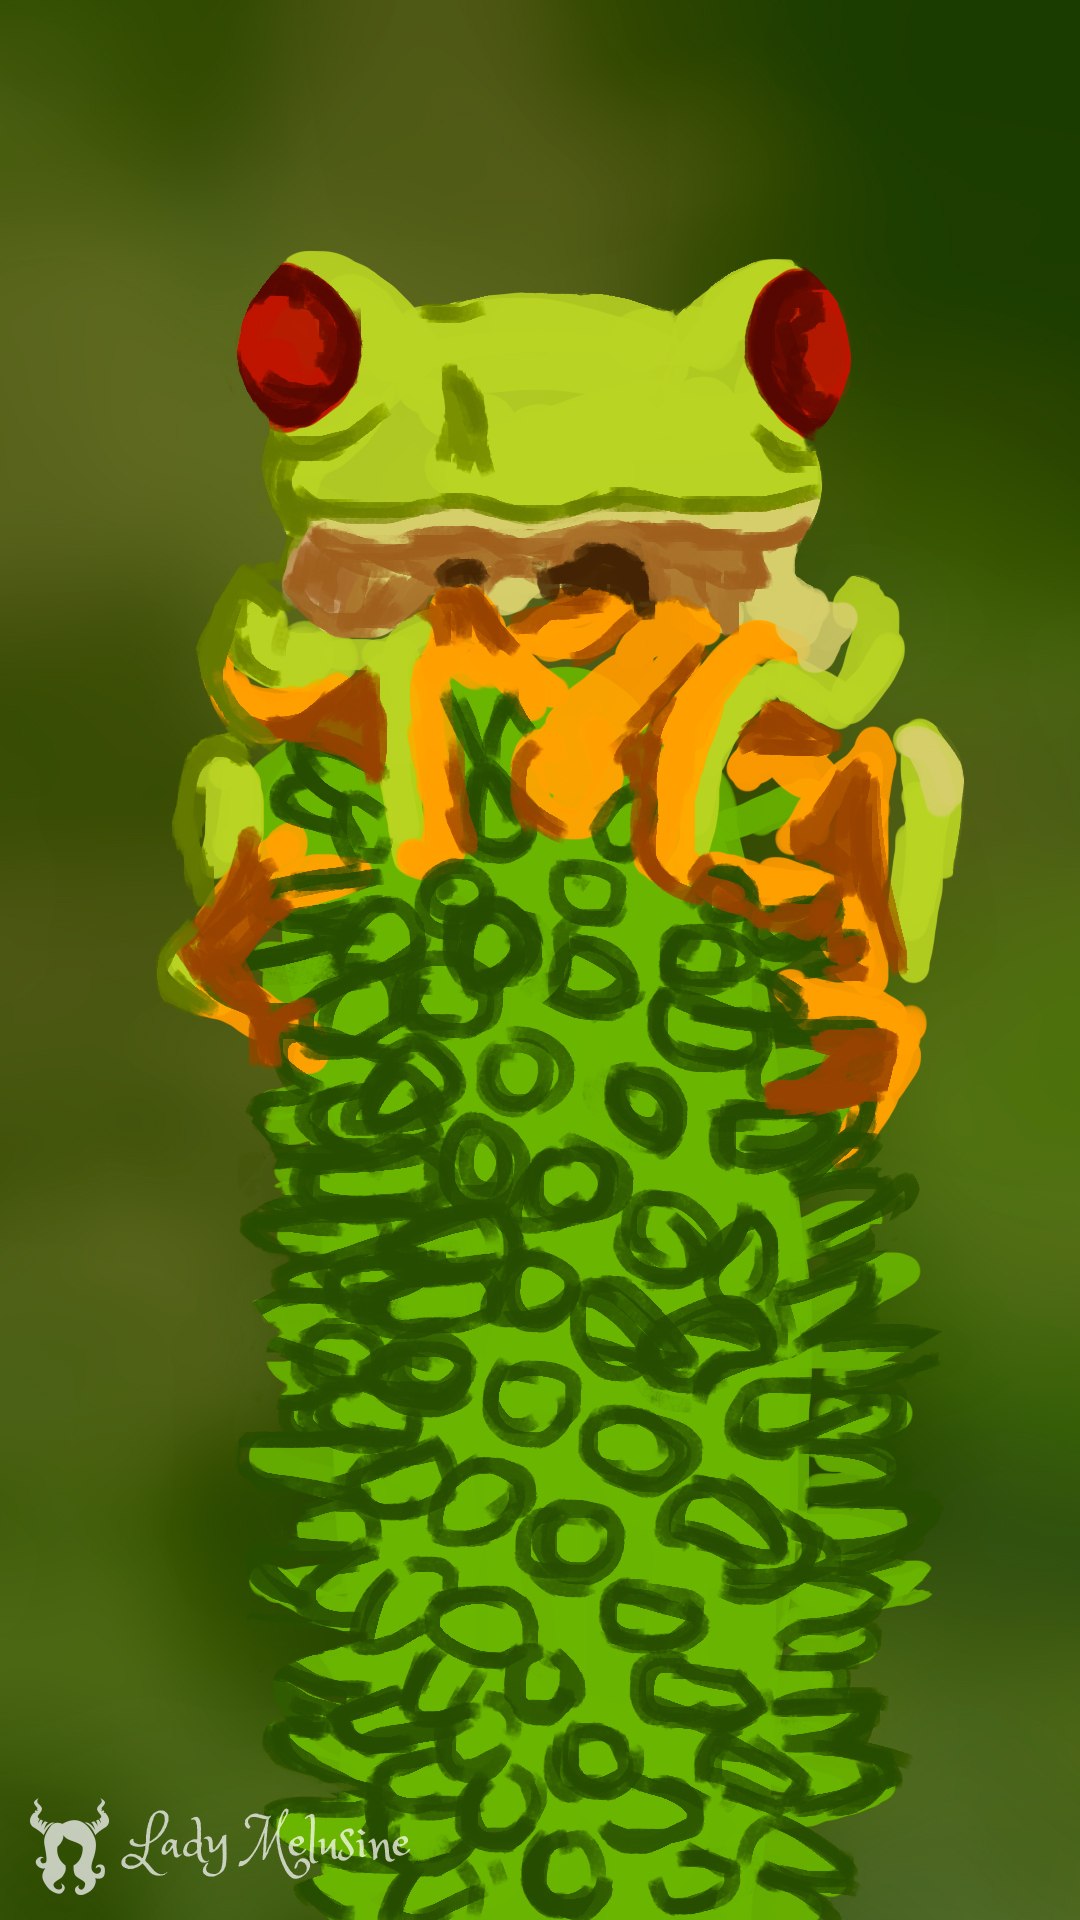 Digital Painting grenouille 04 Lady Melusine